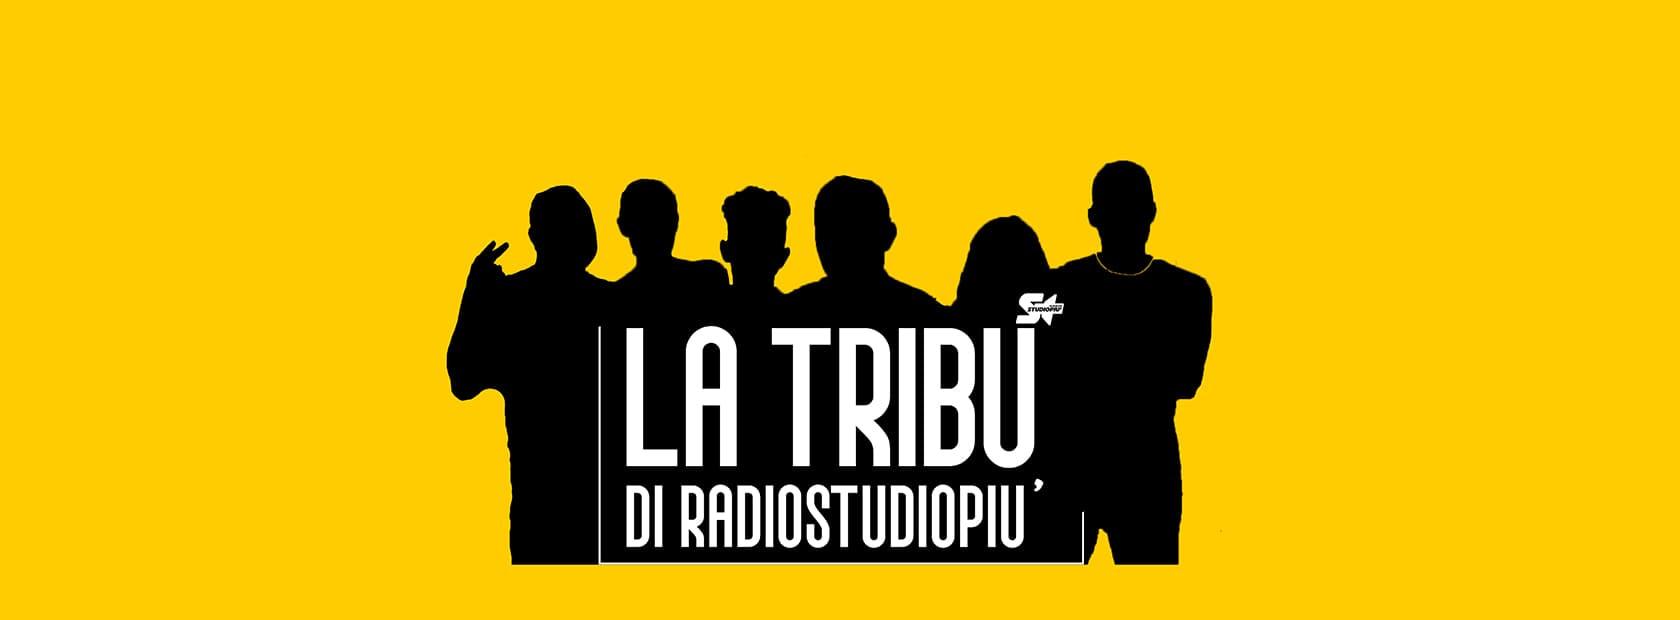 la tribu di radio studiopiu